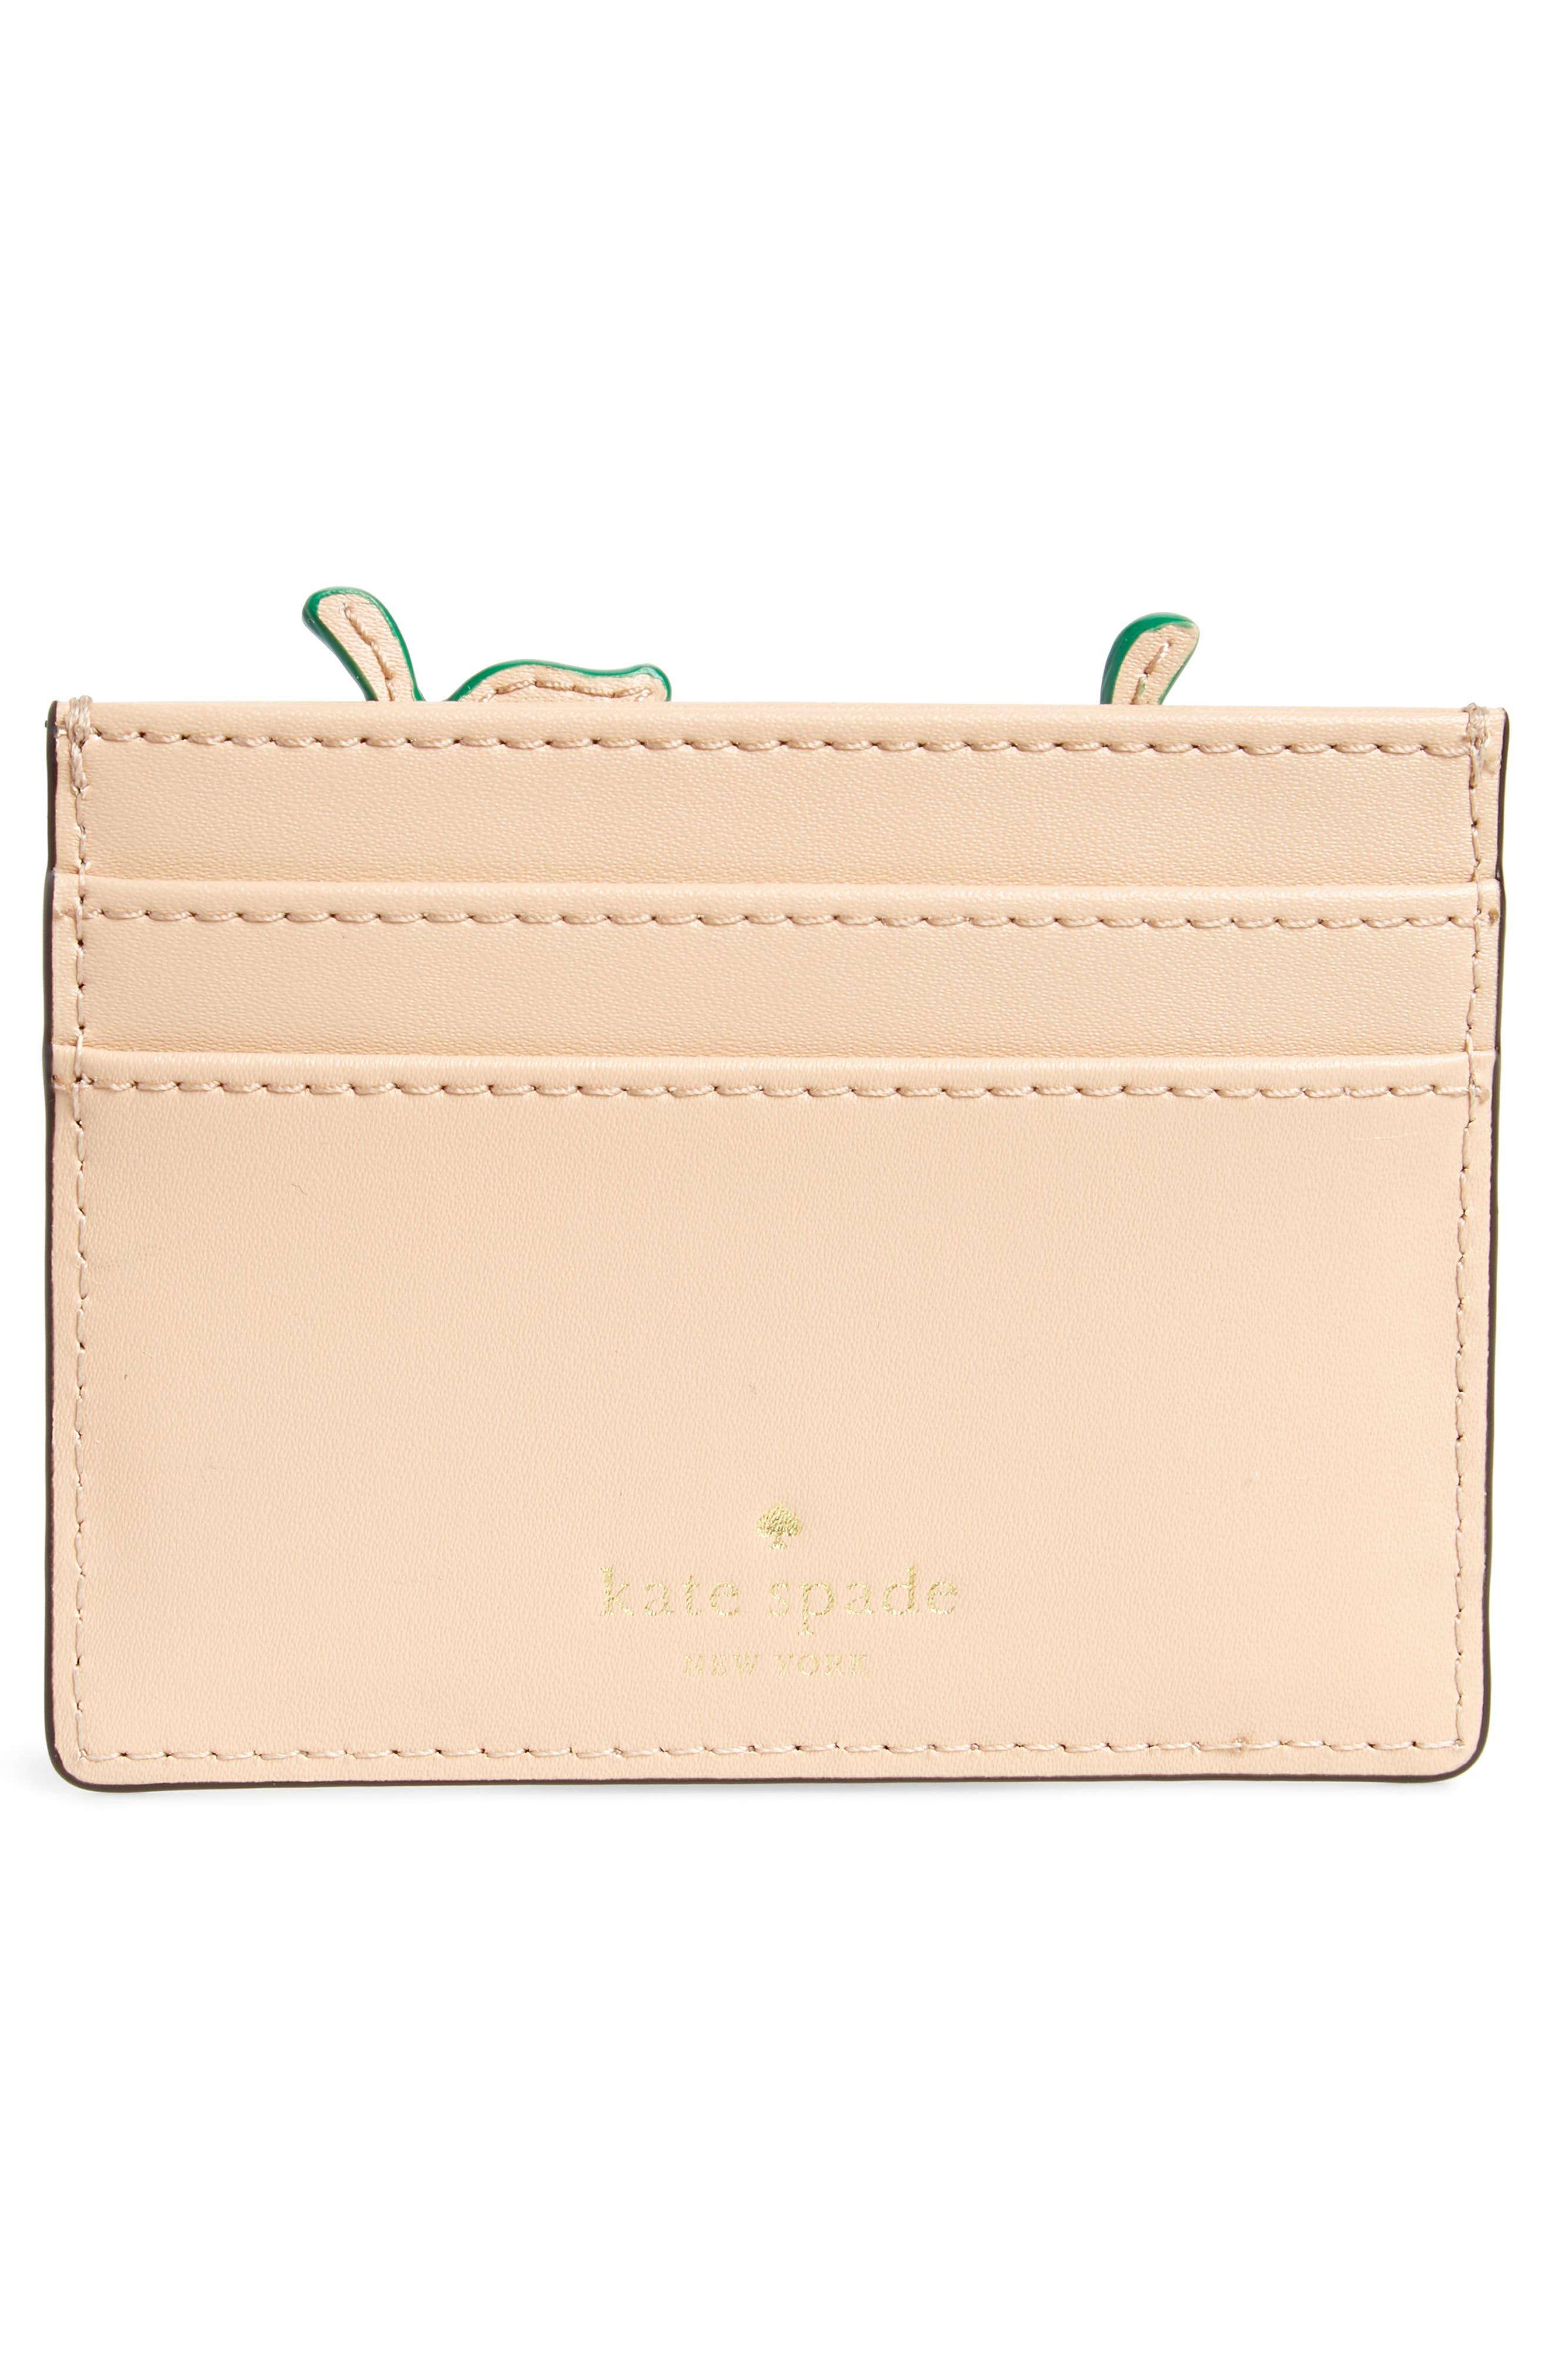 picnic strawberry basket leather card holder,                             Alternate thumbnail 2, color,                             Multi